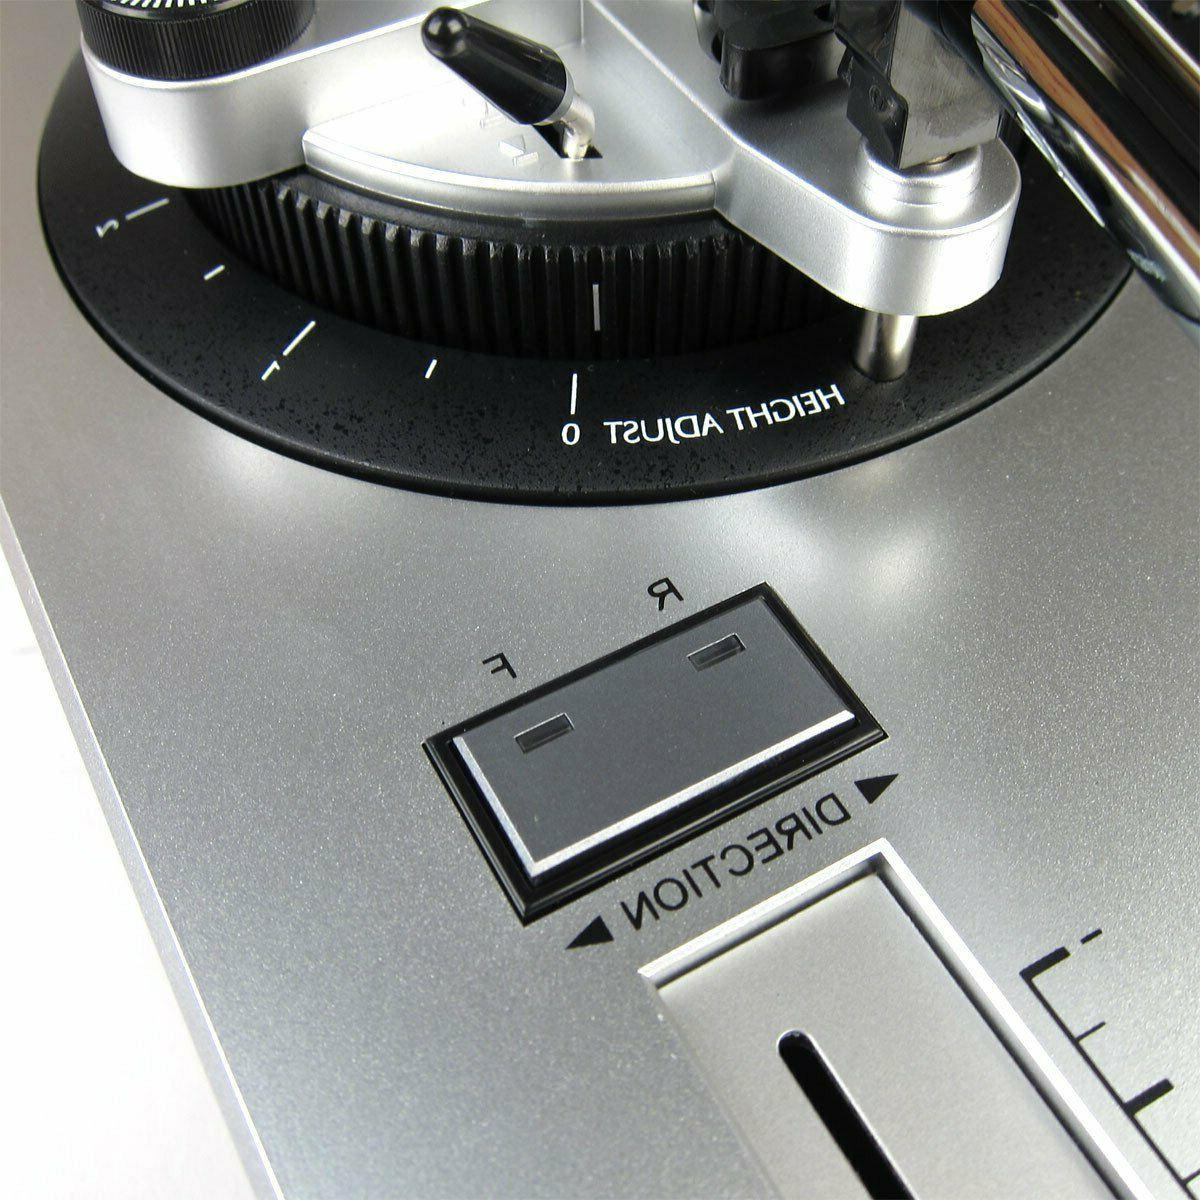 Audio-Technica AT-LP120-USB Pro Stereo USB/Analog